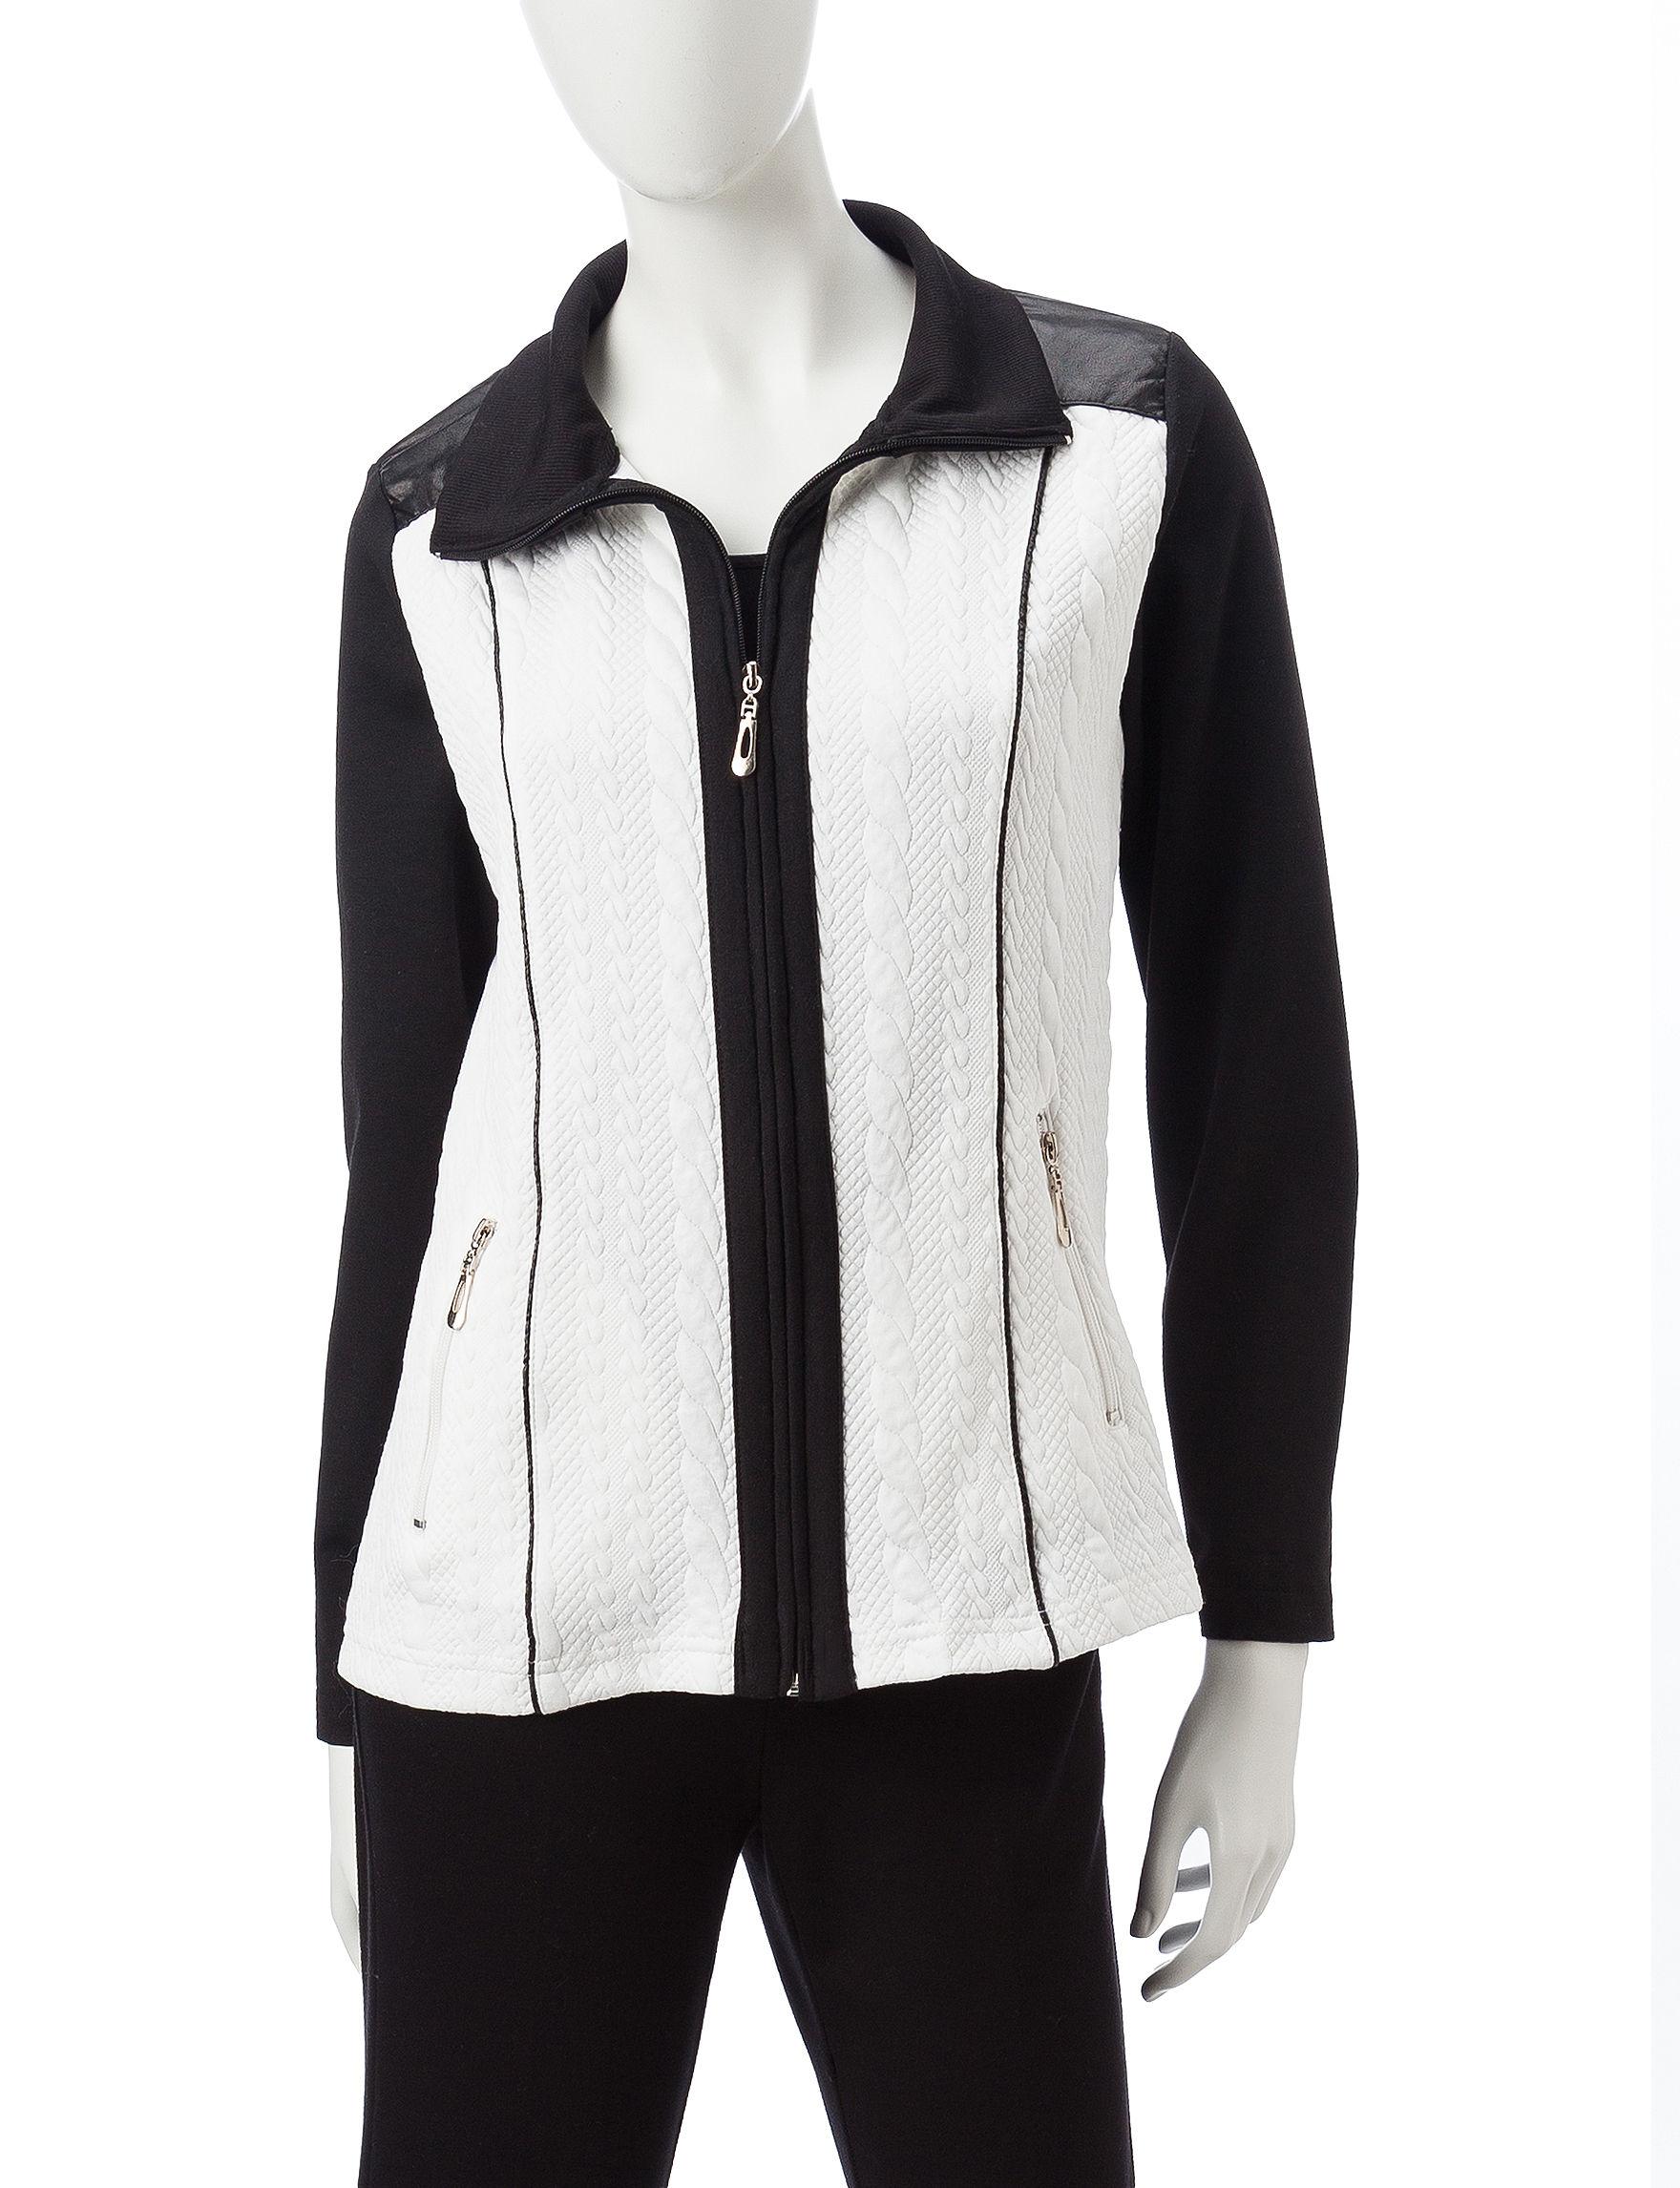 Cathy Daniels Black /  White Lightweight Jackets & Blazers